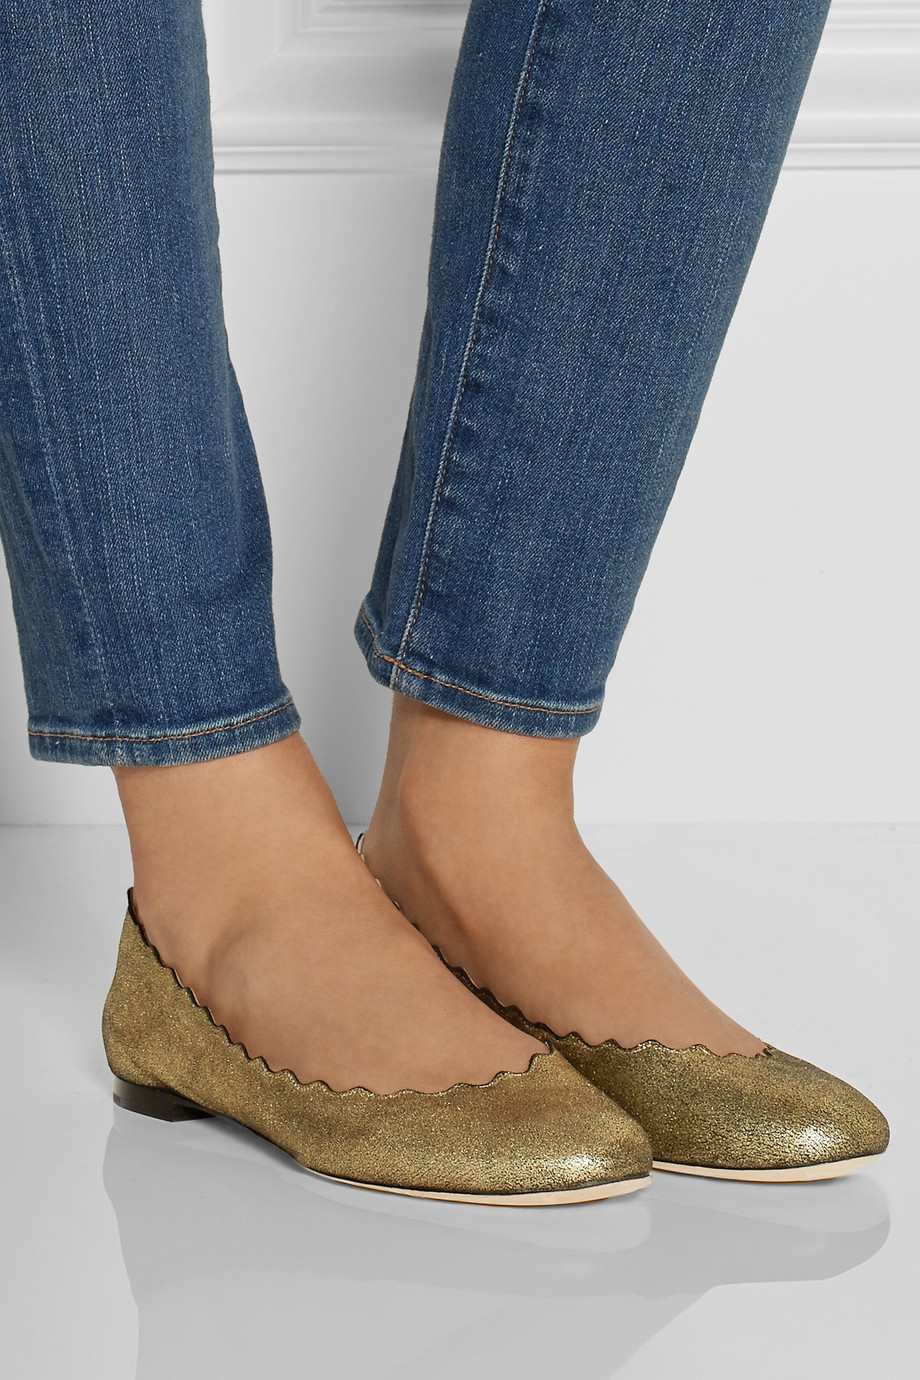 Chloé Lauren Scalloped Metallic Leather Flats qE5LluB